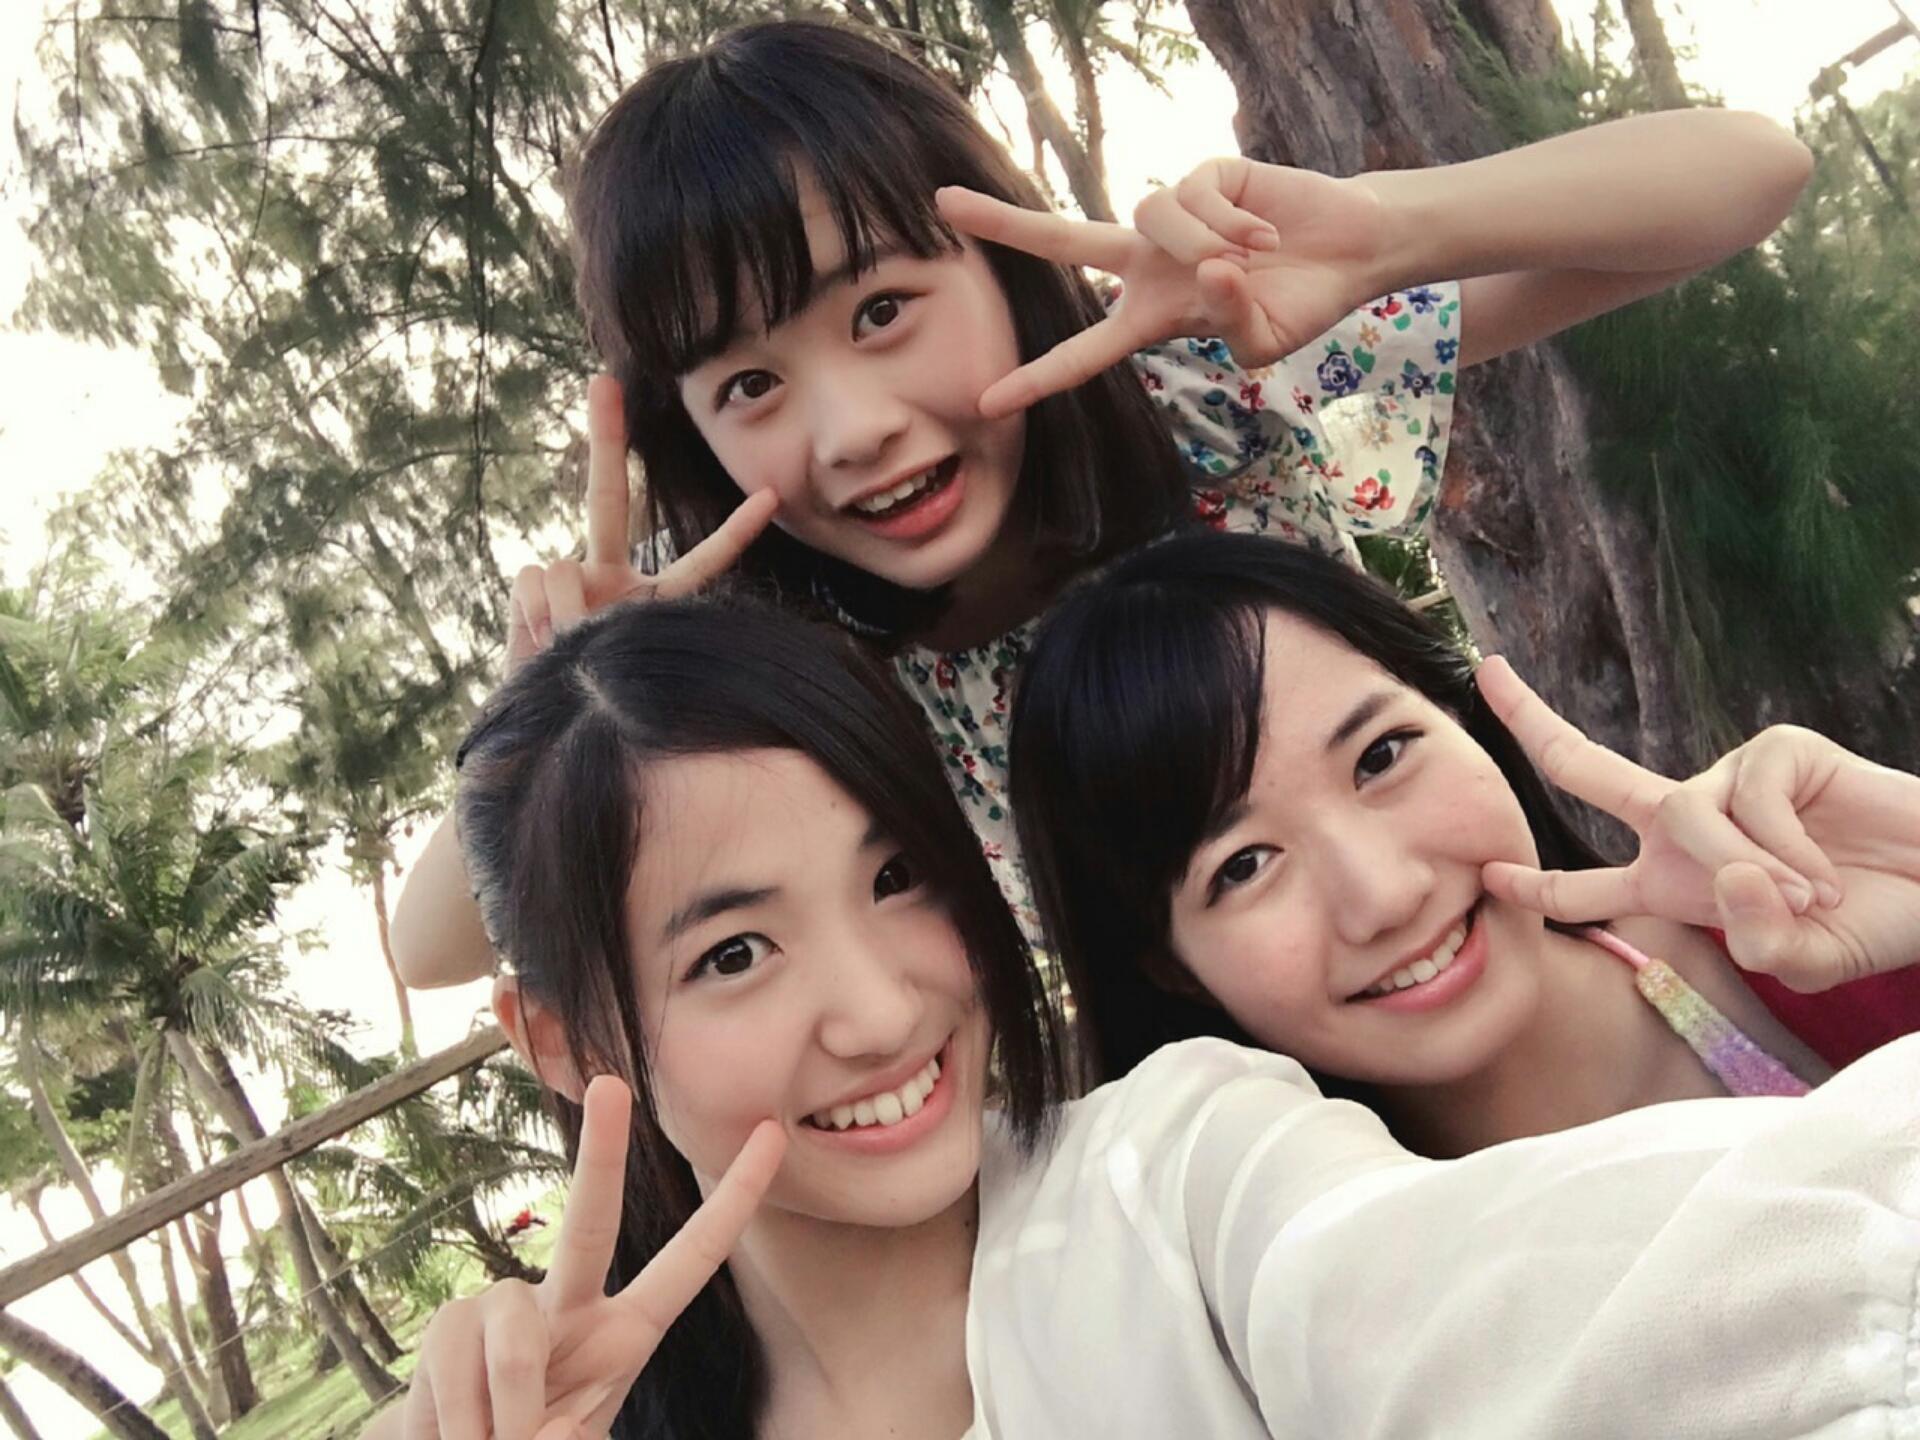 【AKB48チーム8】岩�ア萌花応援スレ★4.2【長崎県代表】 ©2ch.netYouTube動画>10本 ->画像>267枚